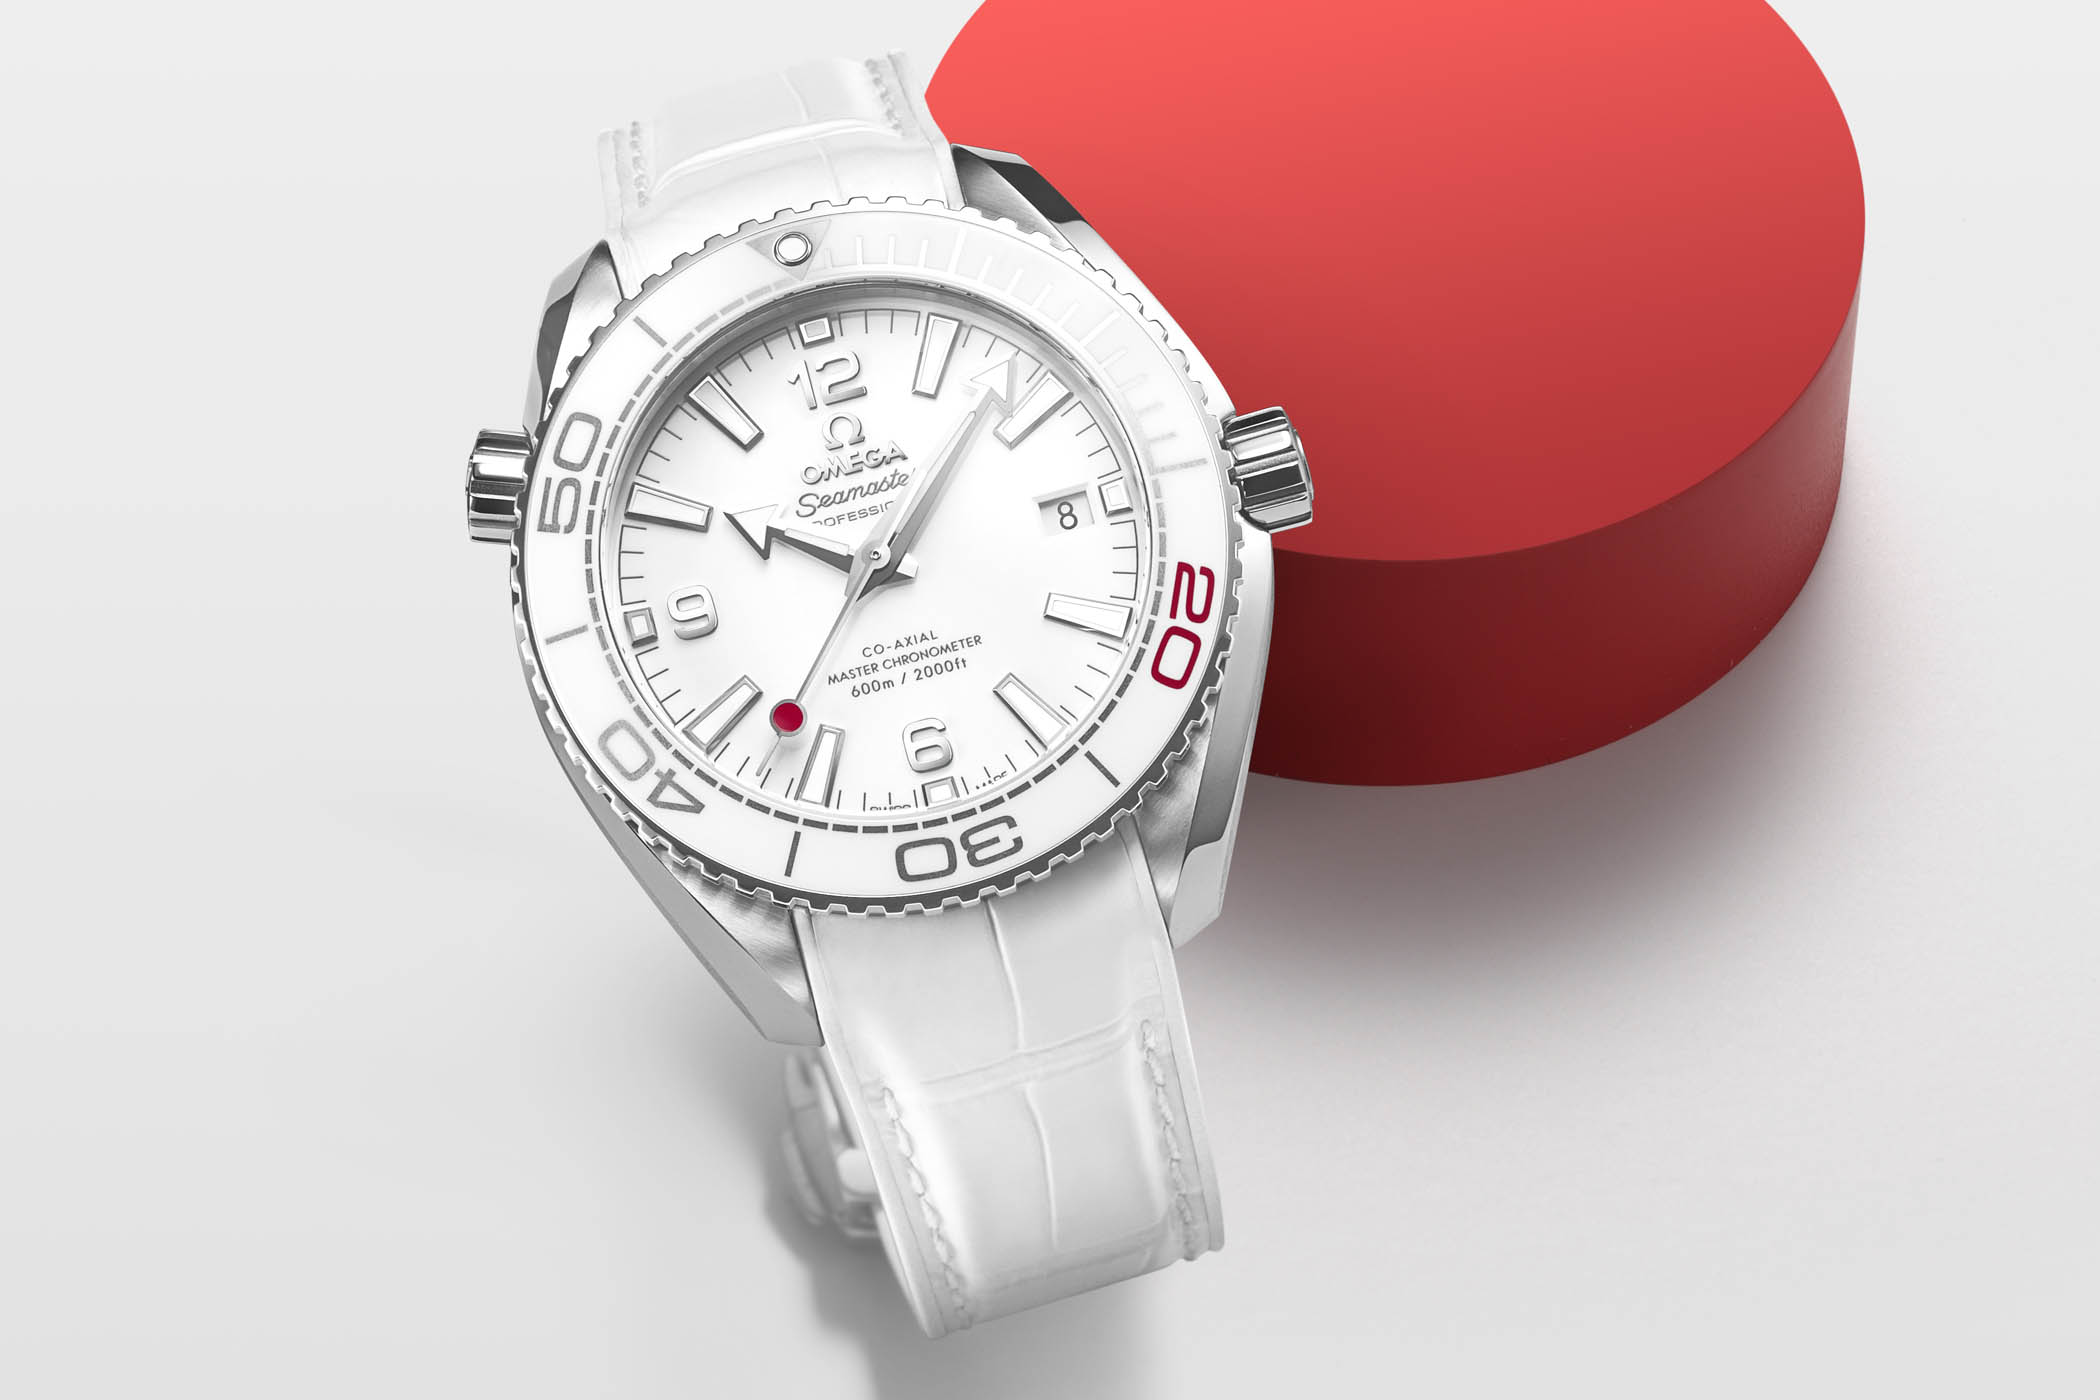 Omega Seamaster Planet Ocean Tokyo 2020 Countdown 522.33.40.20.04.001